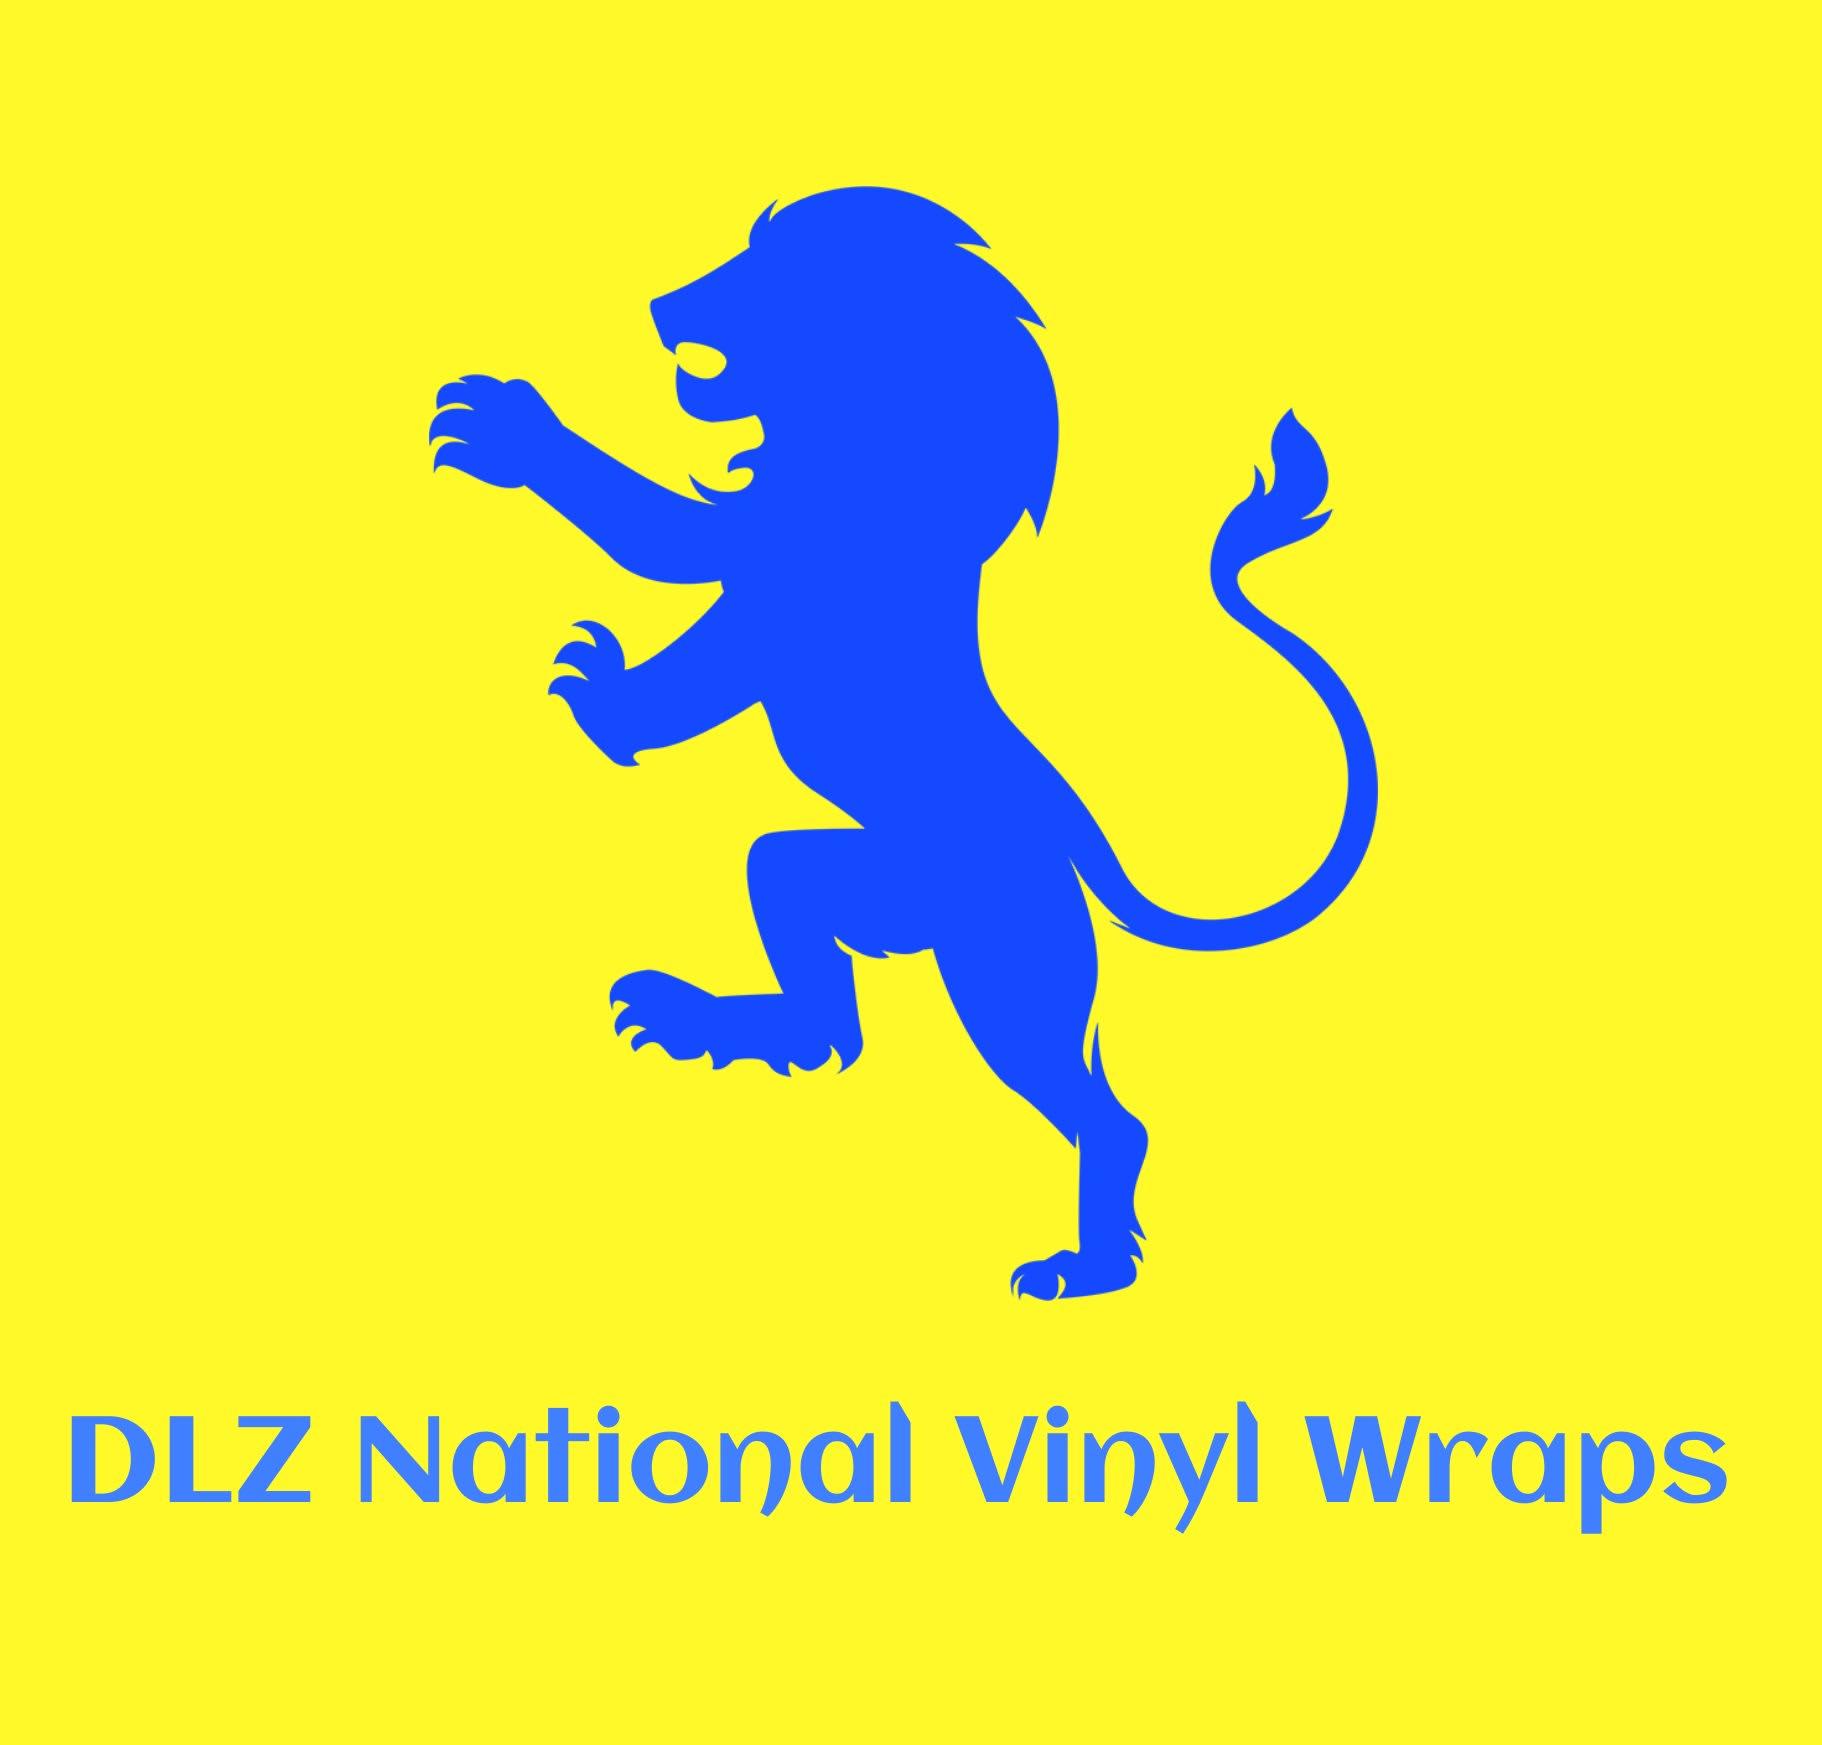 DLZ Vinyl Designs